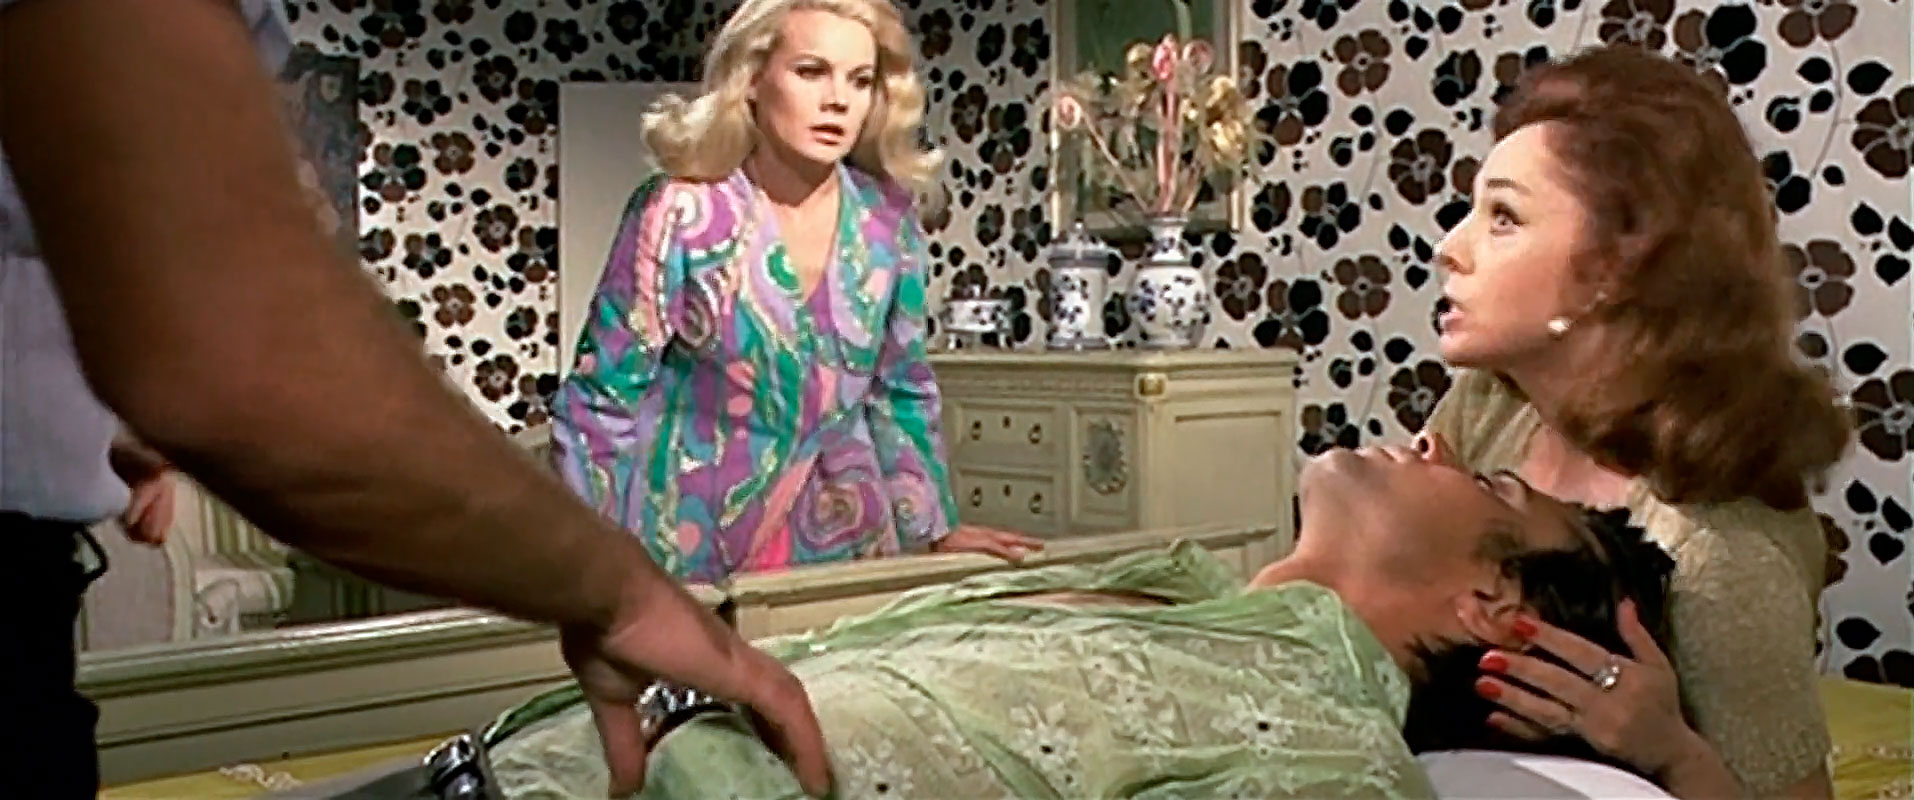 Паранойя / Тихое место для убийства / Paranoia / A Quiet Place To Kill (1970 Умберто Ленци)